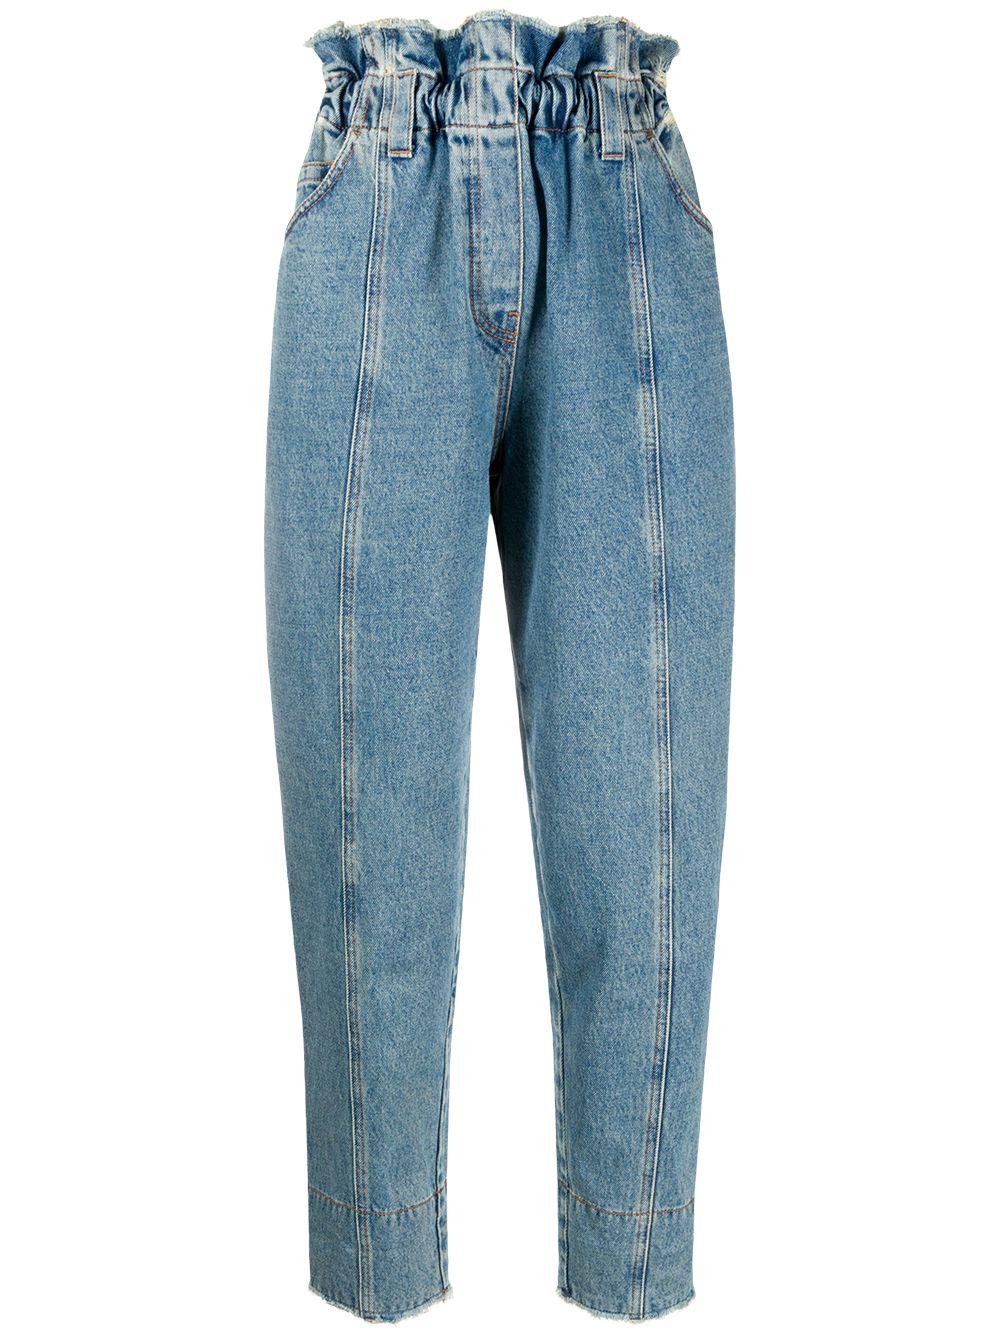 PHILOSOPHY DI LORENZO SERAFINI PHILOSOPHY DI LORENZO SERAFINI   Jeans   J03255730300